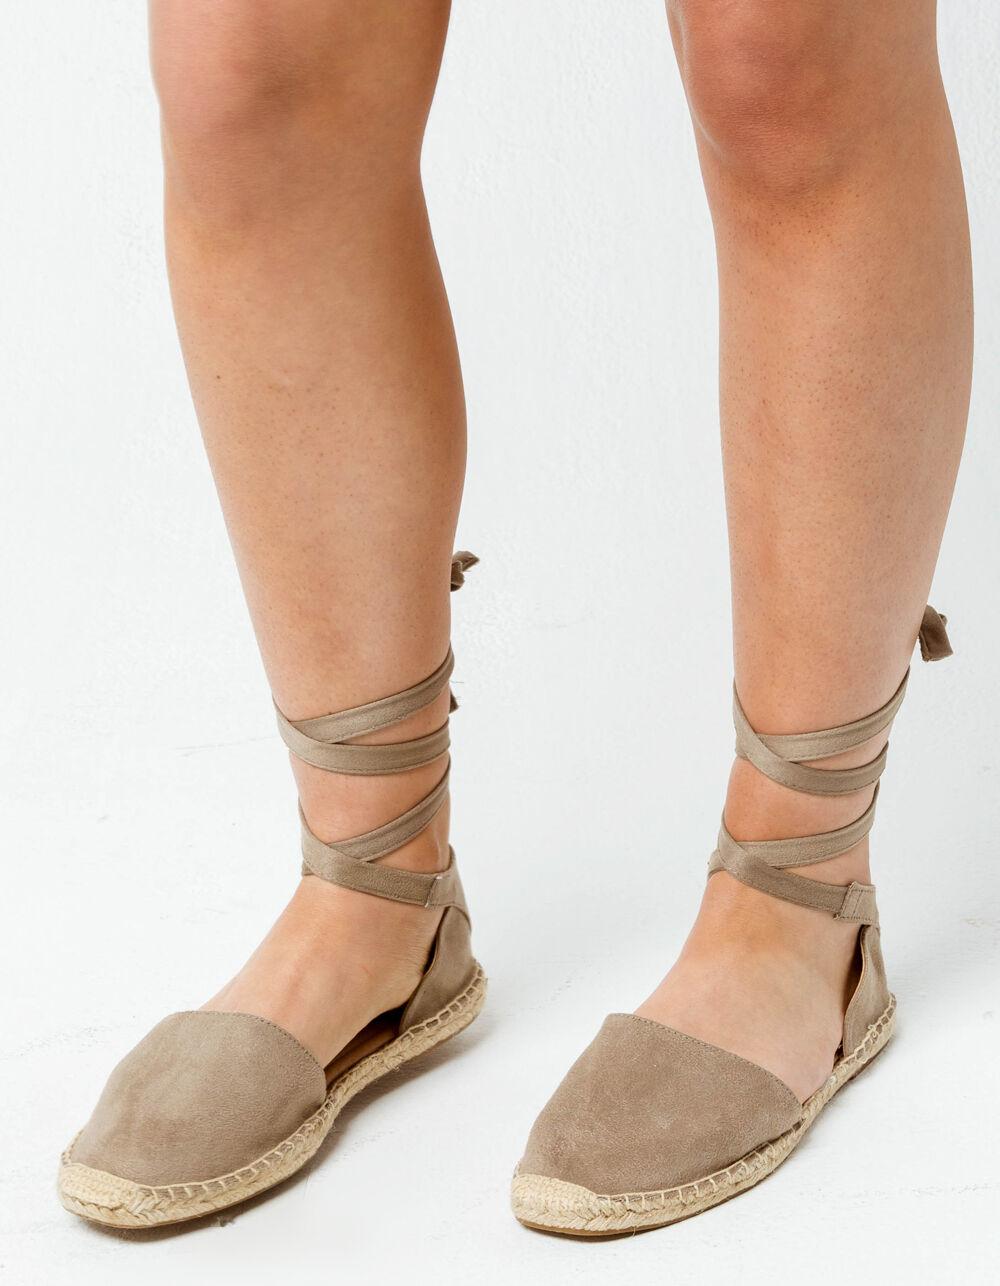 SODA Lace Up Taupe Espadrille Flatform Sandals